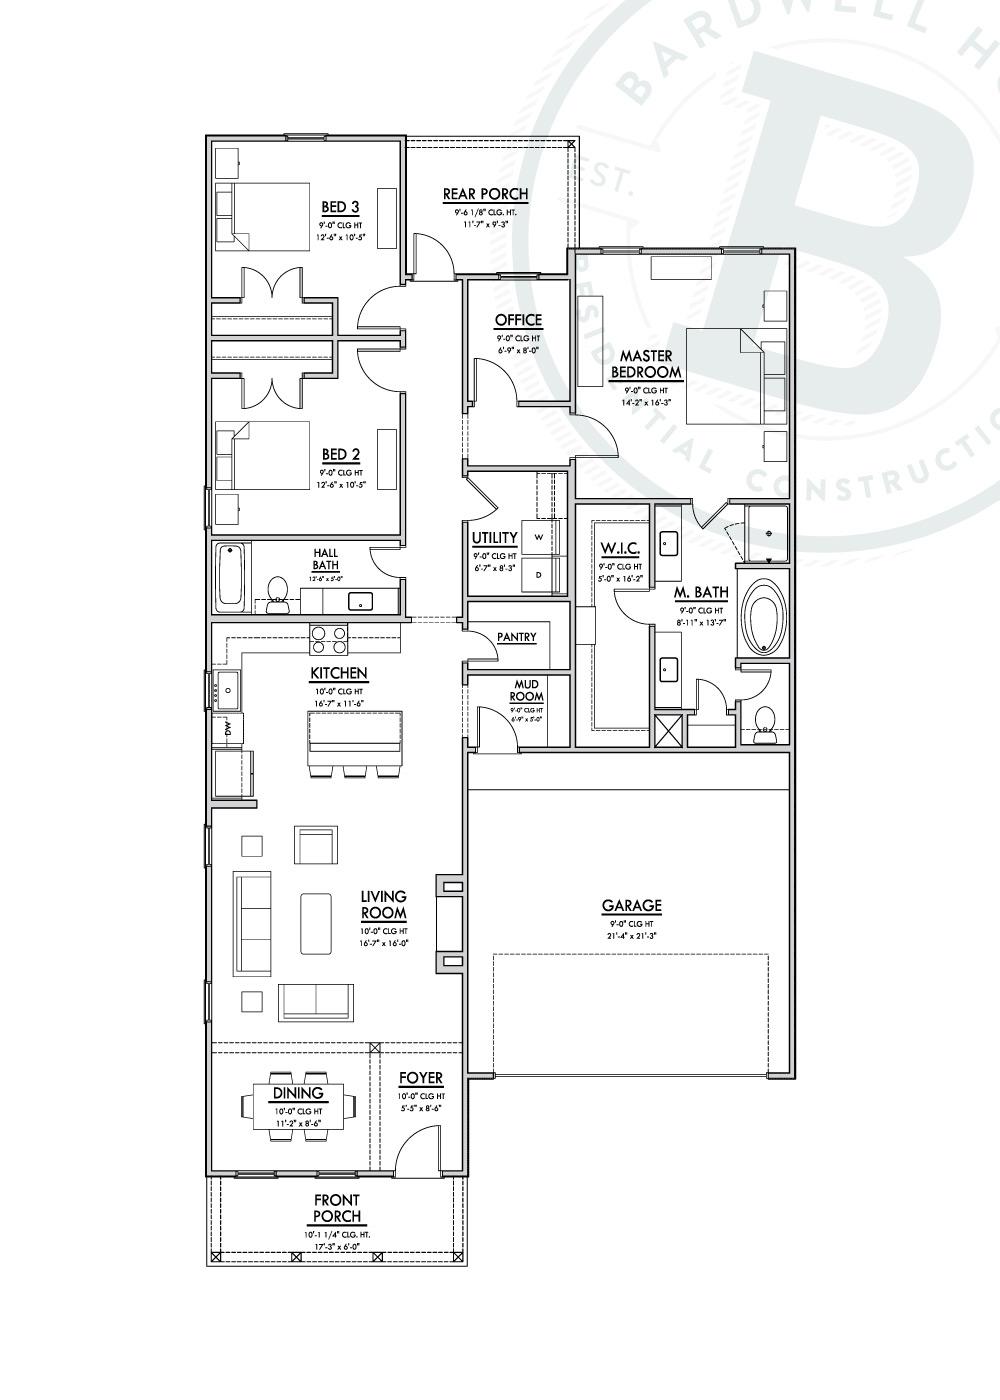 Octavia-A_Floorplan_4.26.19